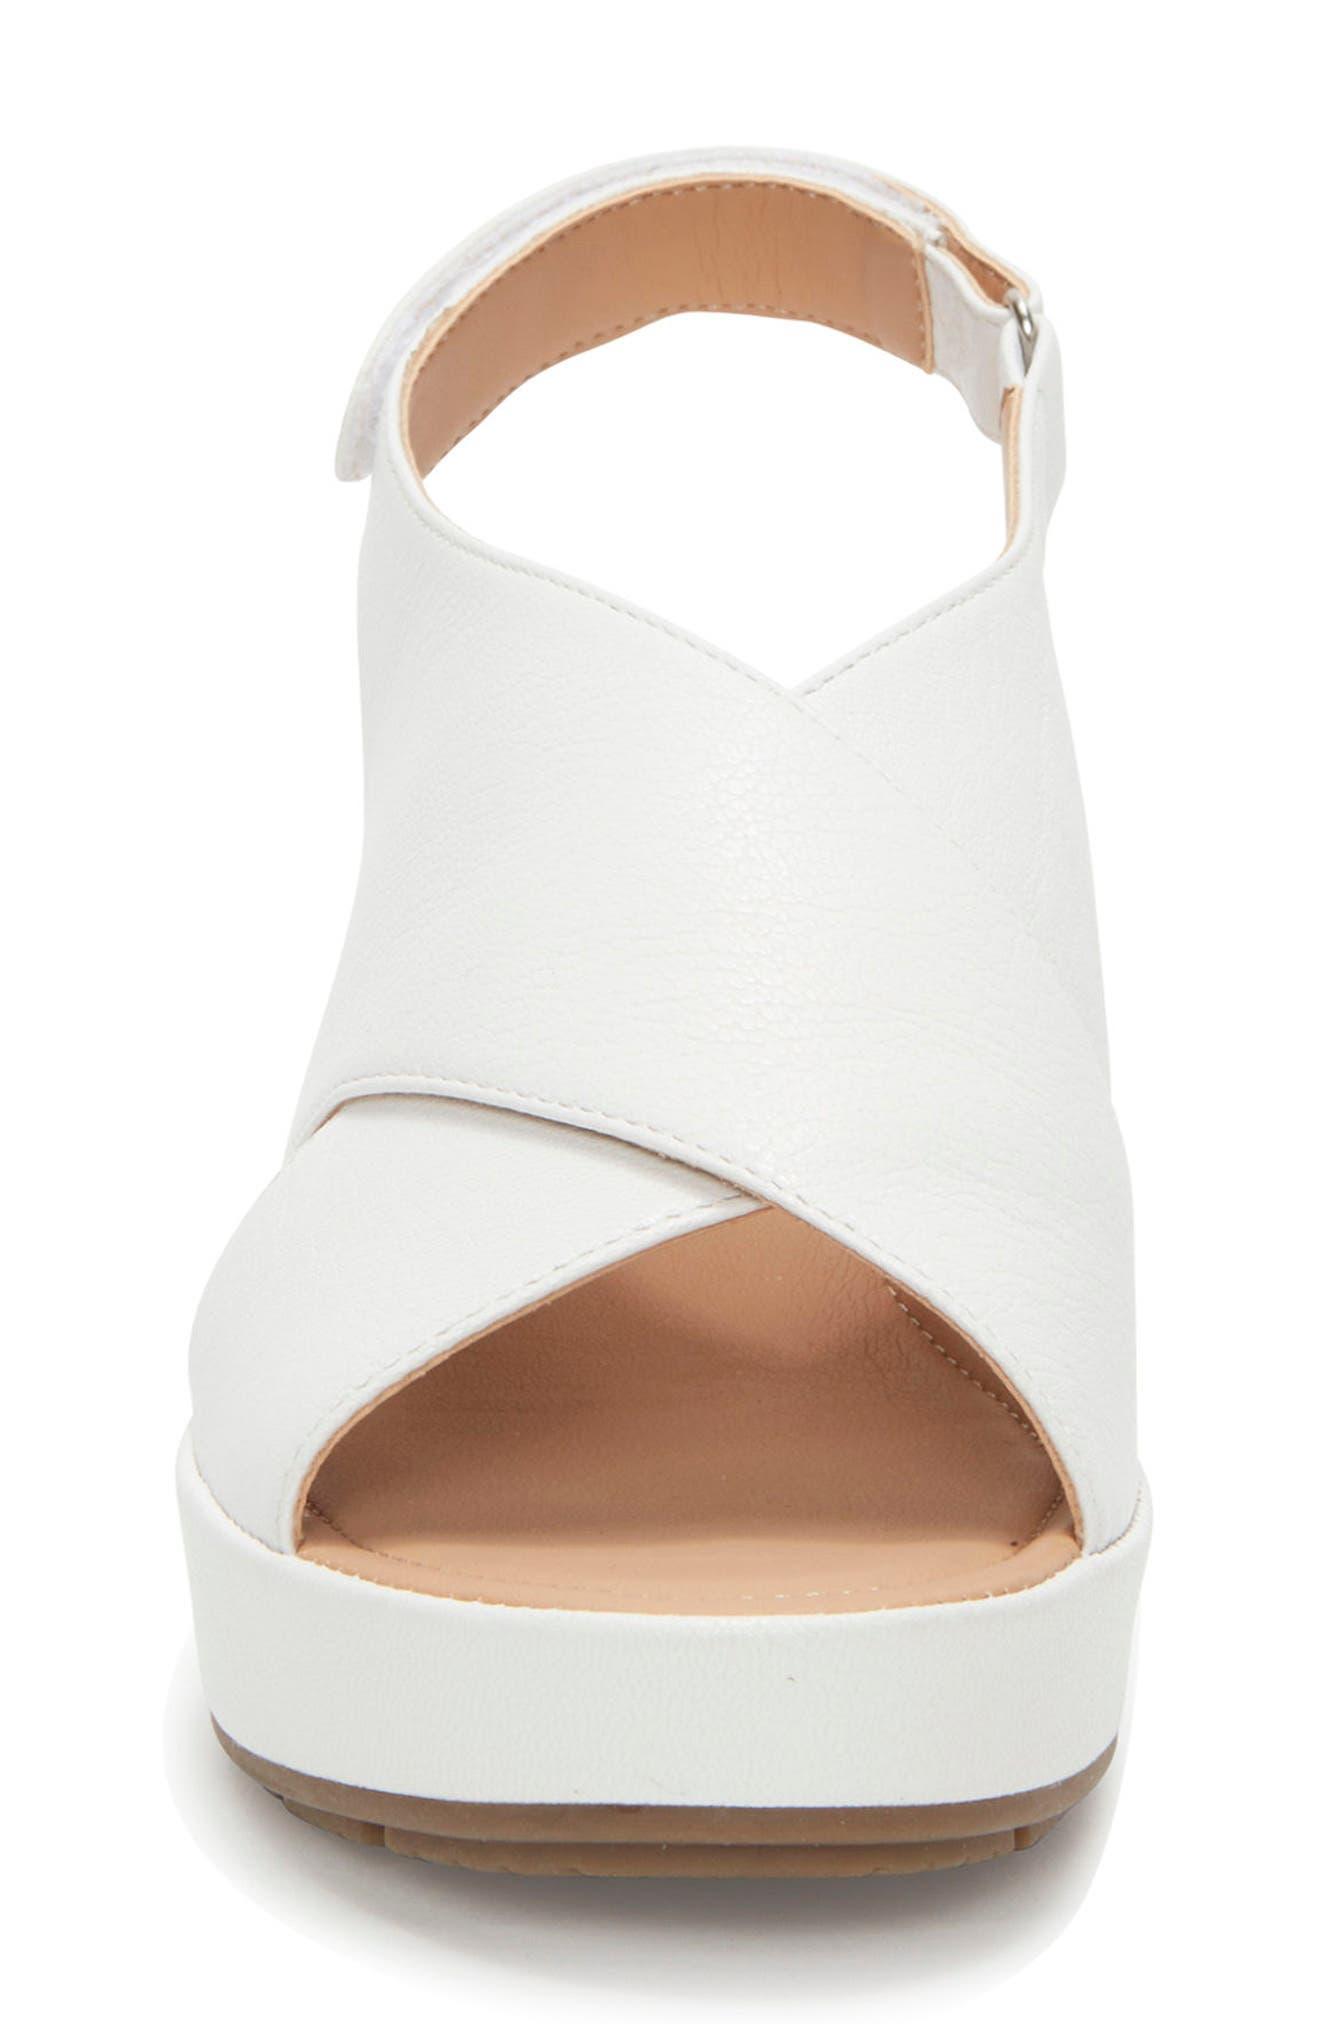 Arena Wedge Sandal,                             Alternate thumbnail 4, color,                             White Leather